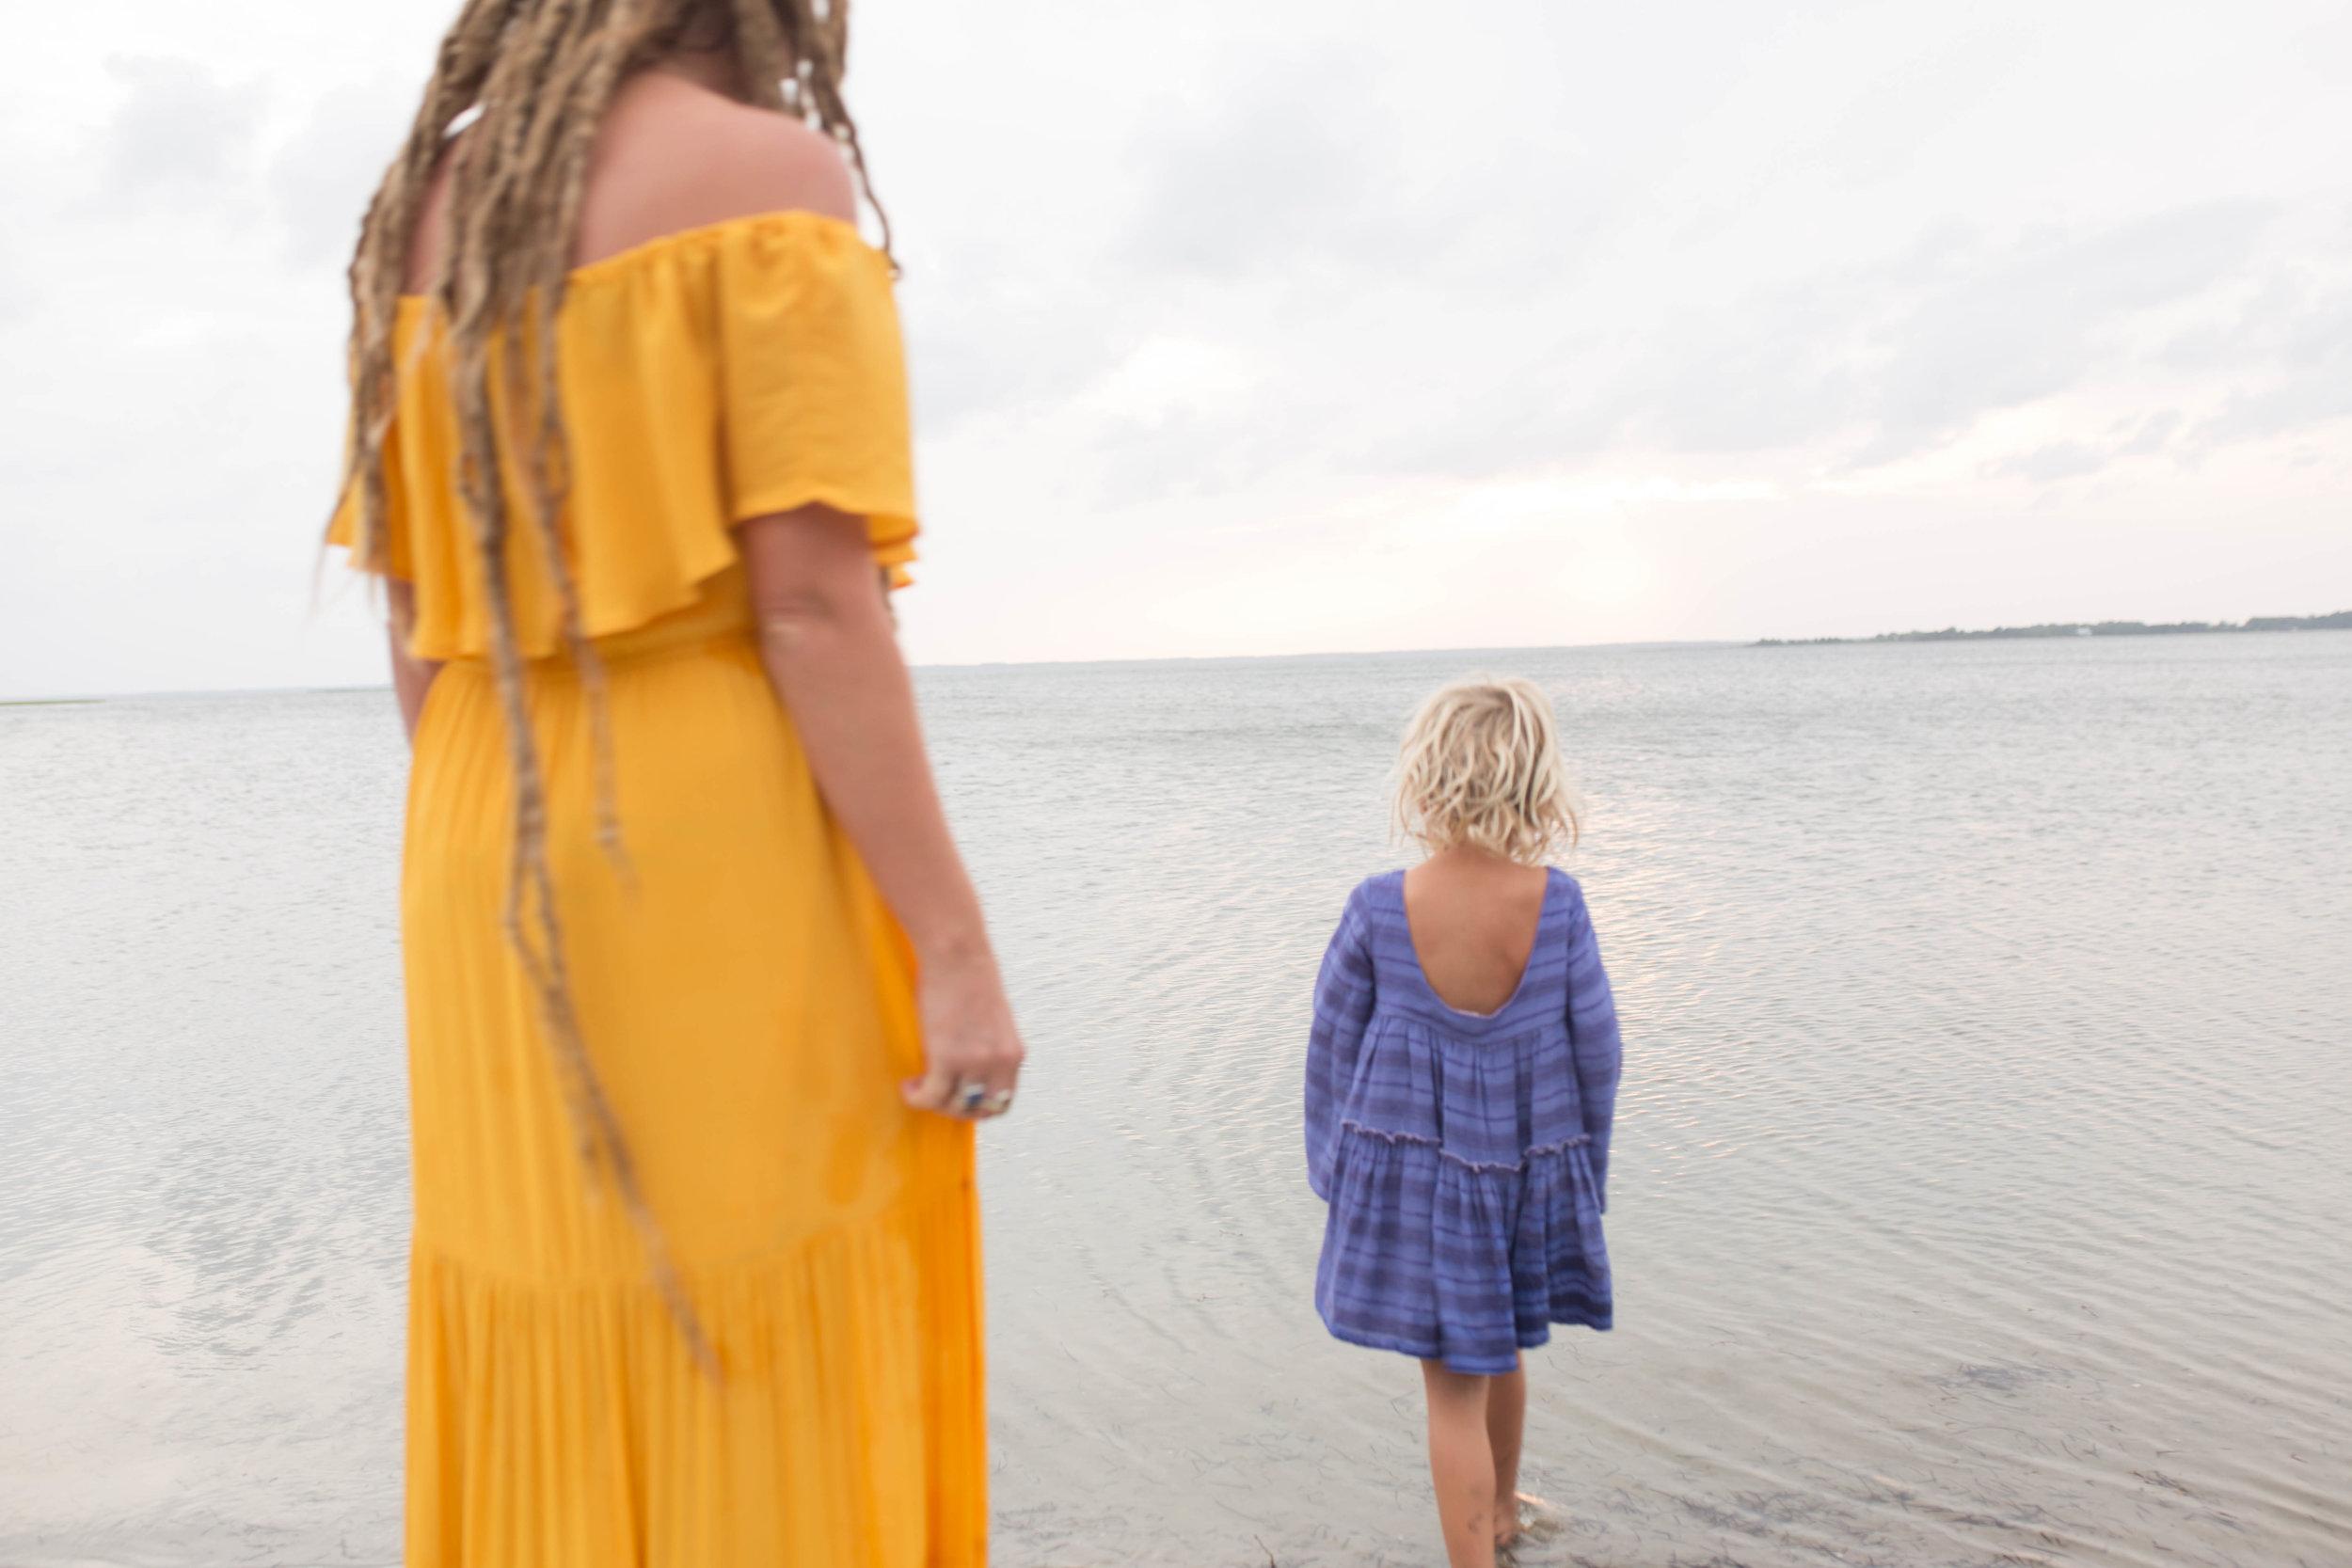 Assateague Island Photographer - Family Photographer - Pittsburgh Family Photographer - Beach Photography-0488-2.jpg